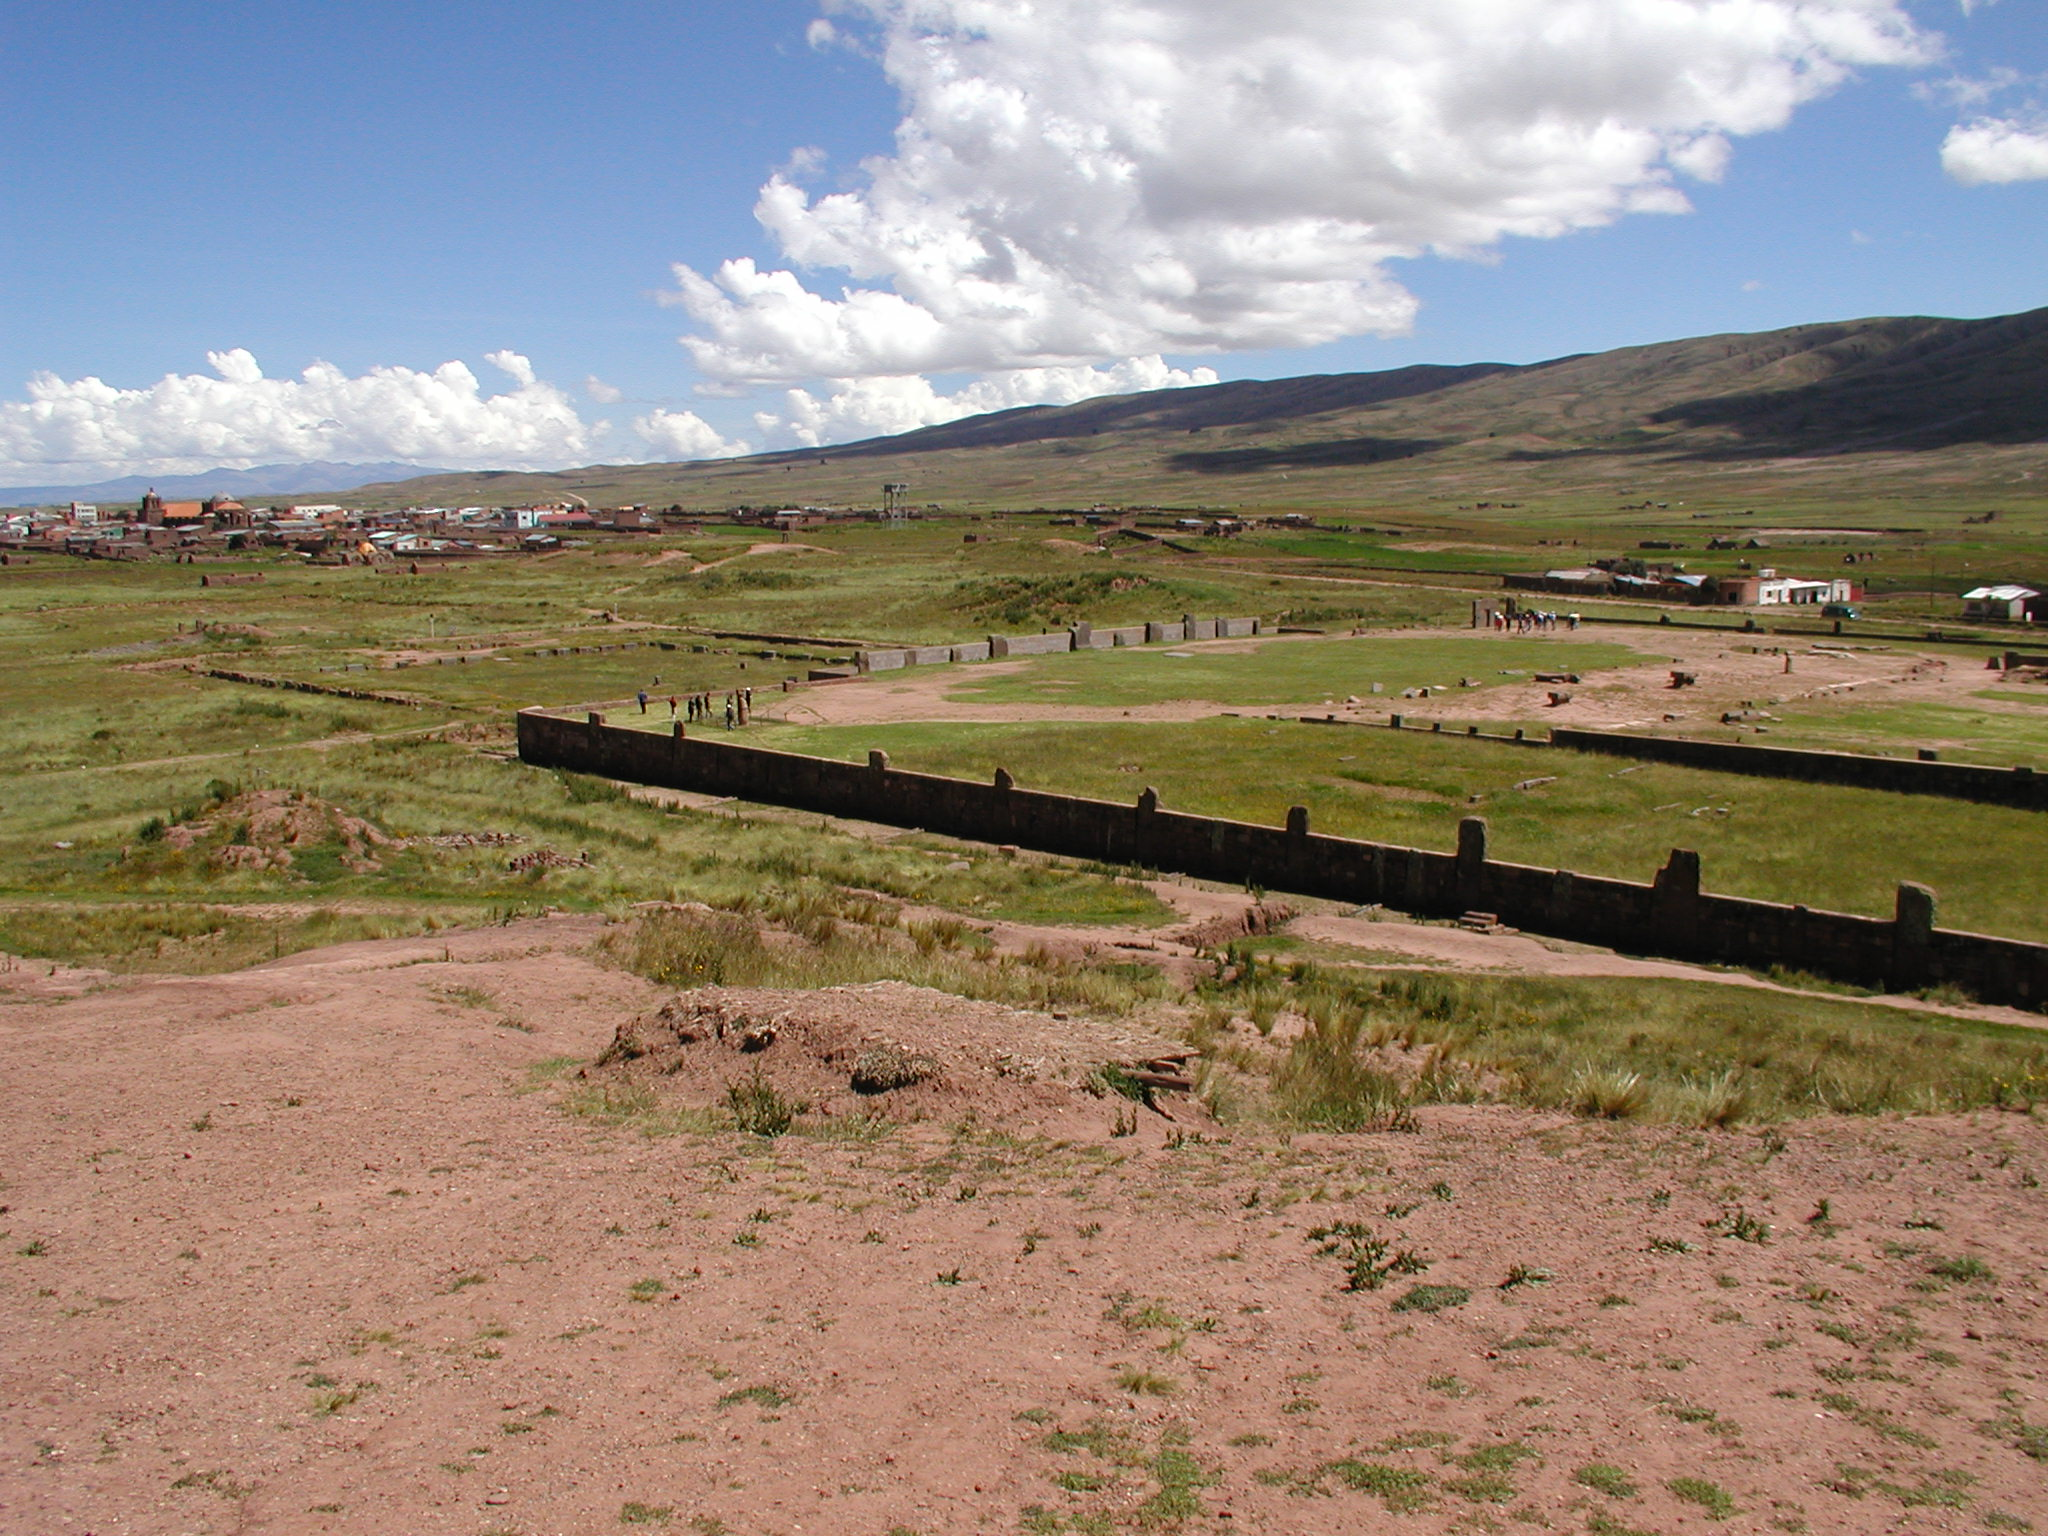 Tihuanaco panorama 1.jpg